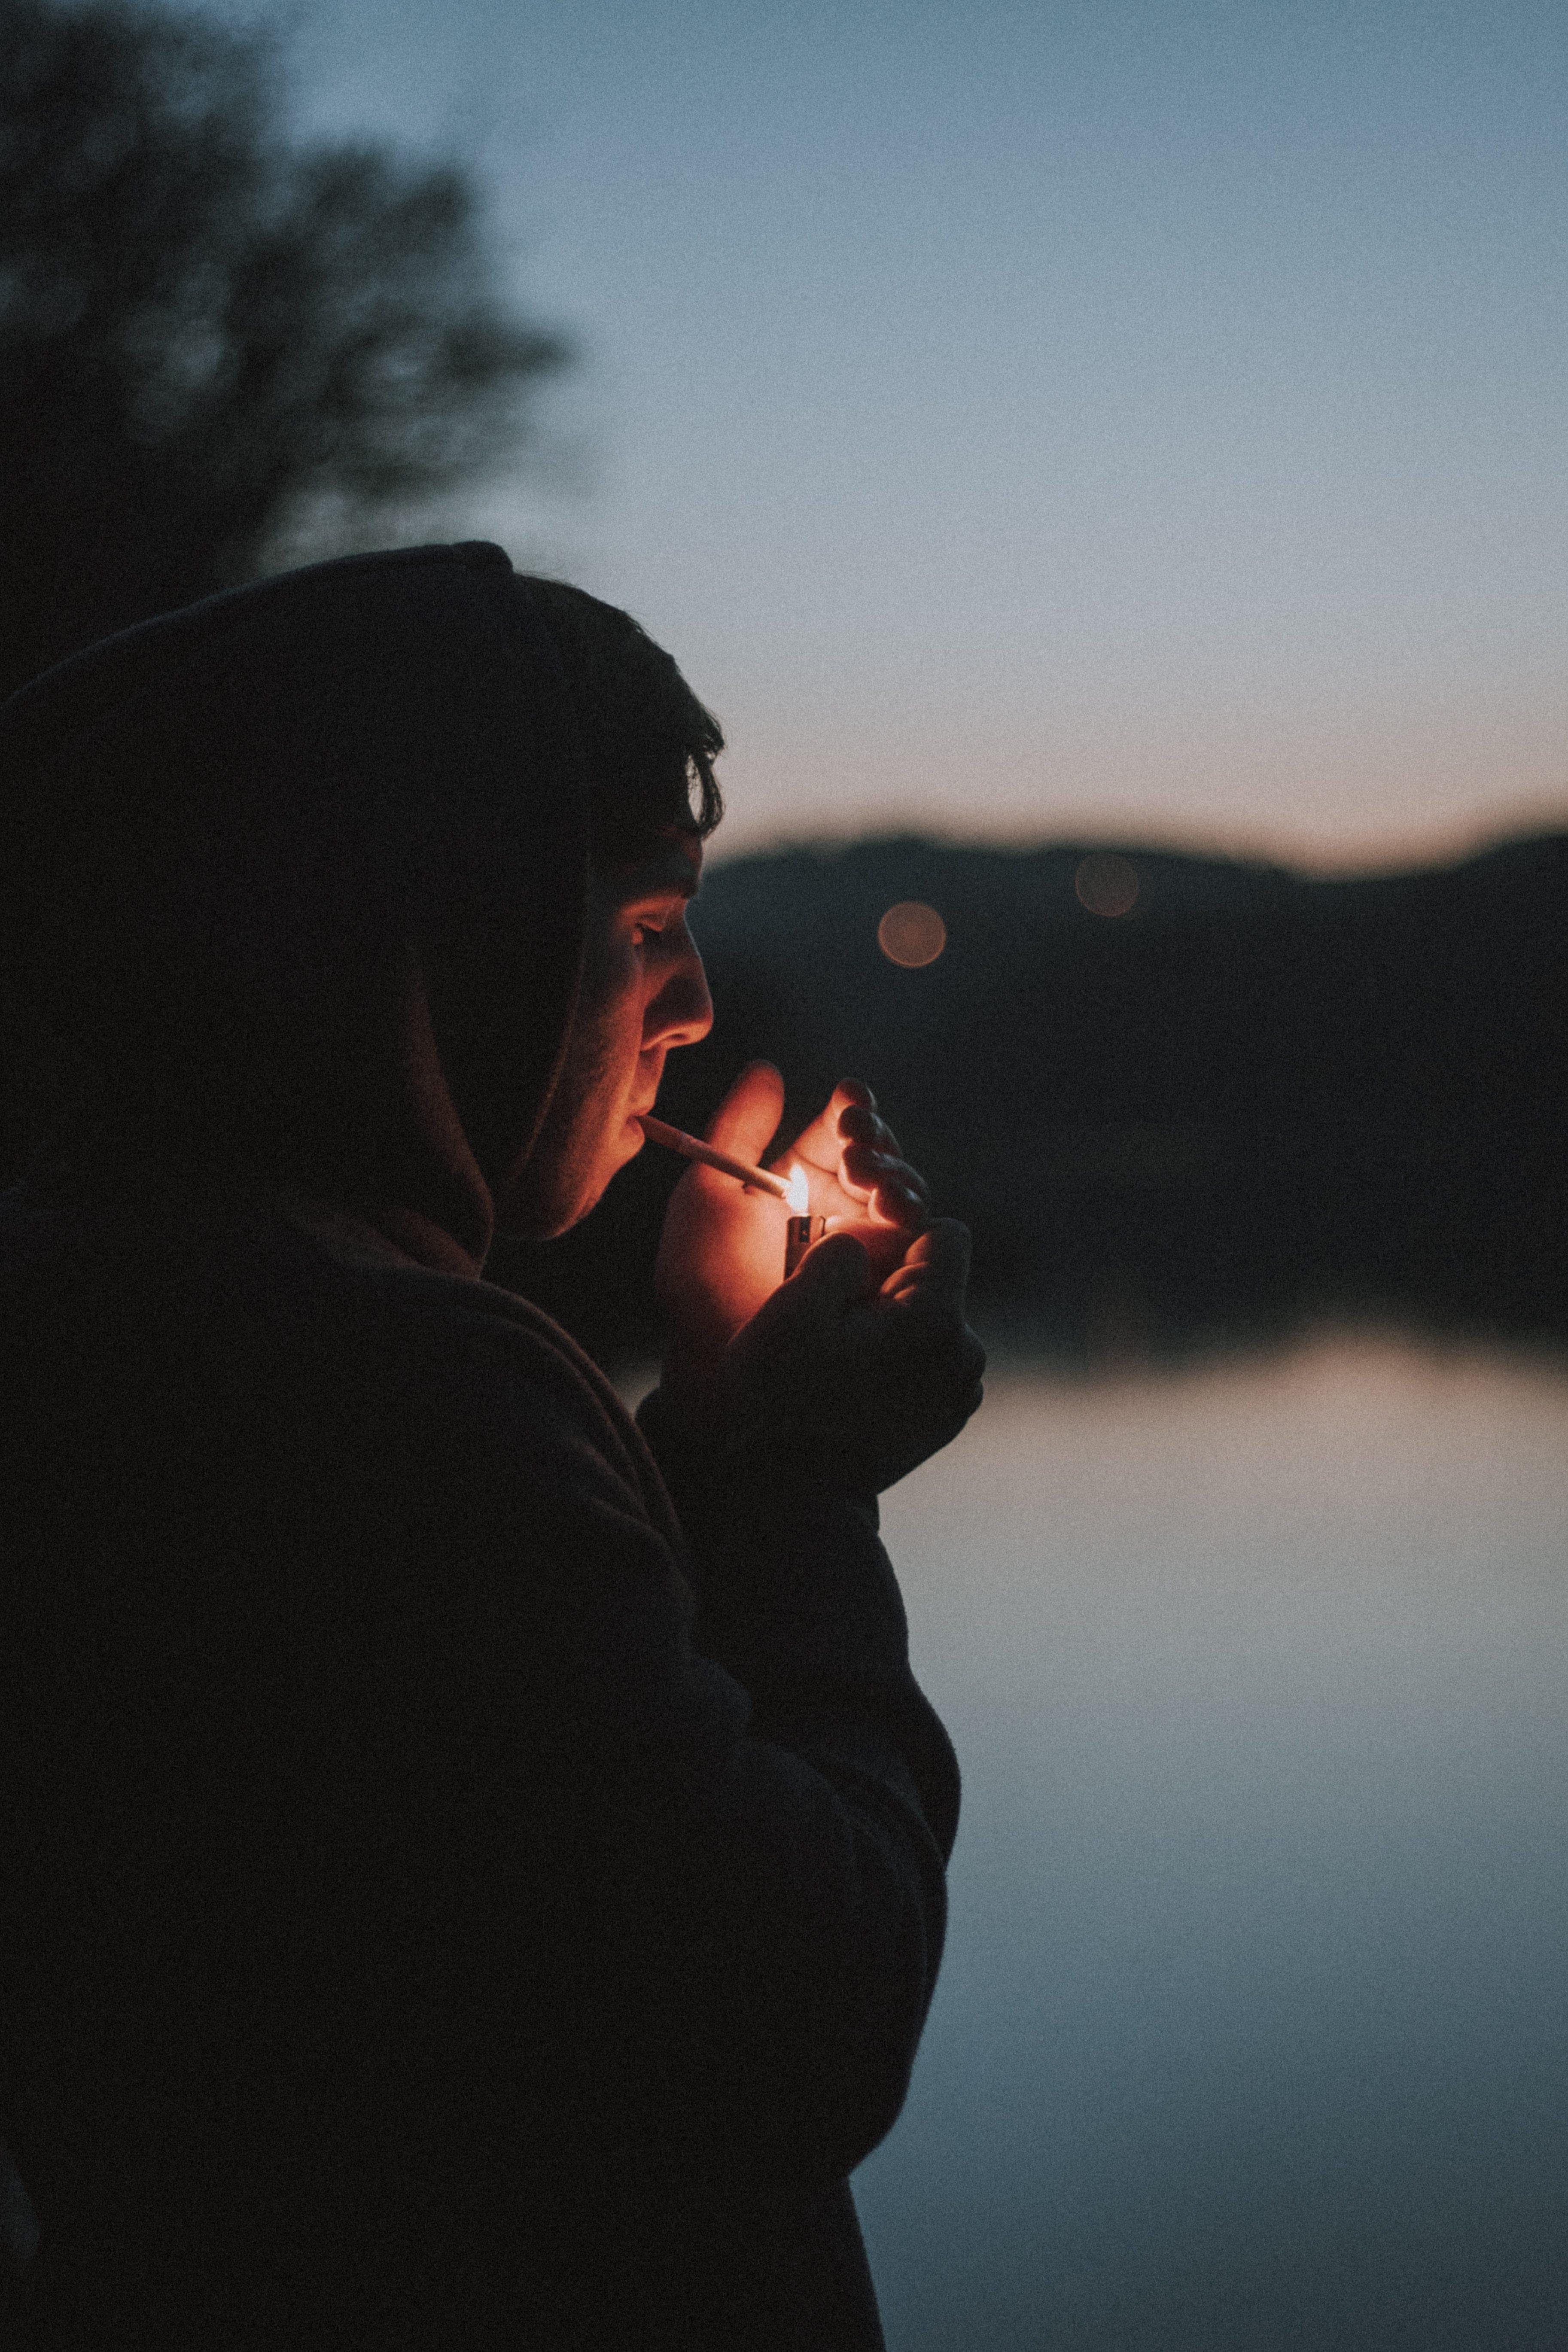 addictive behavior